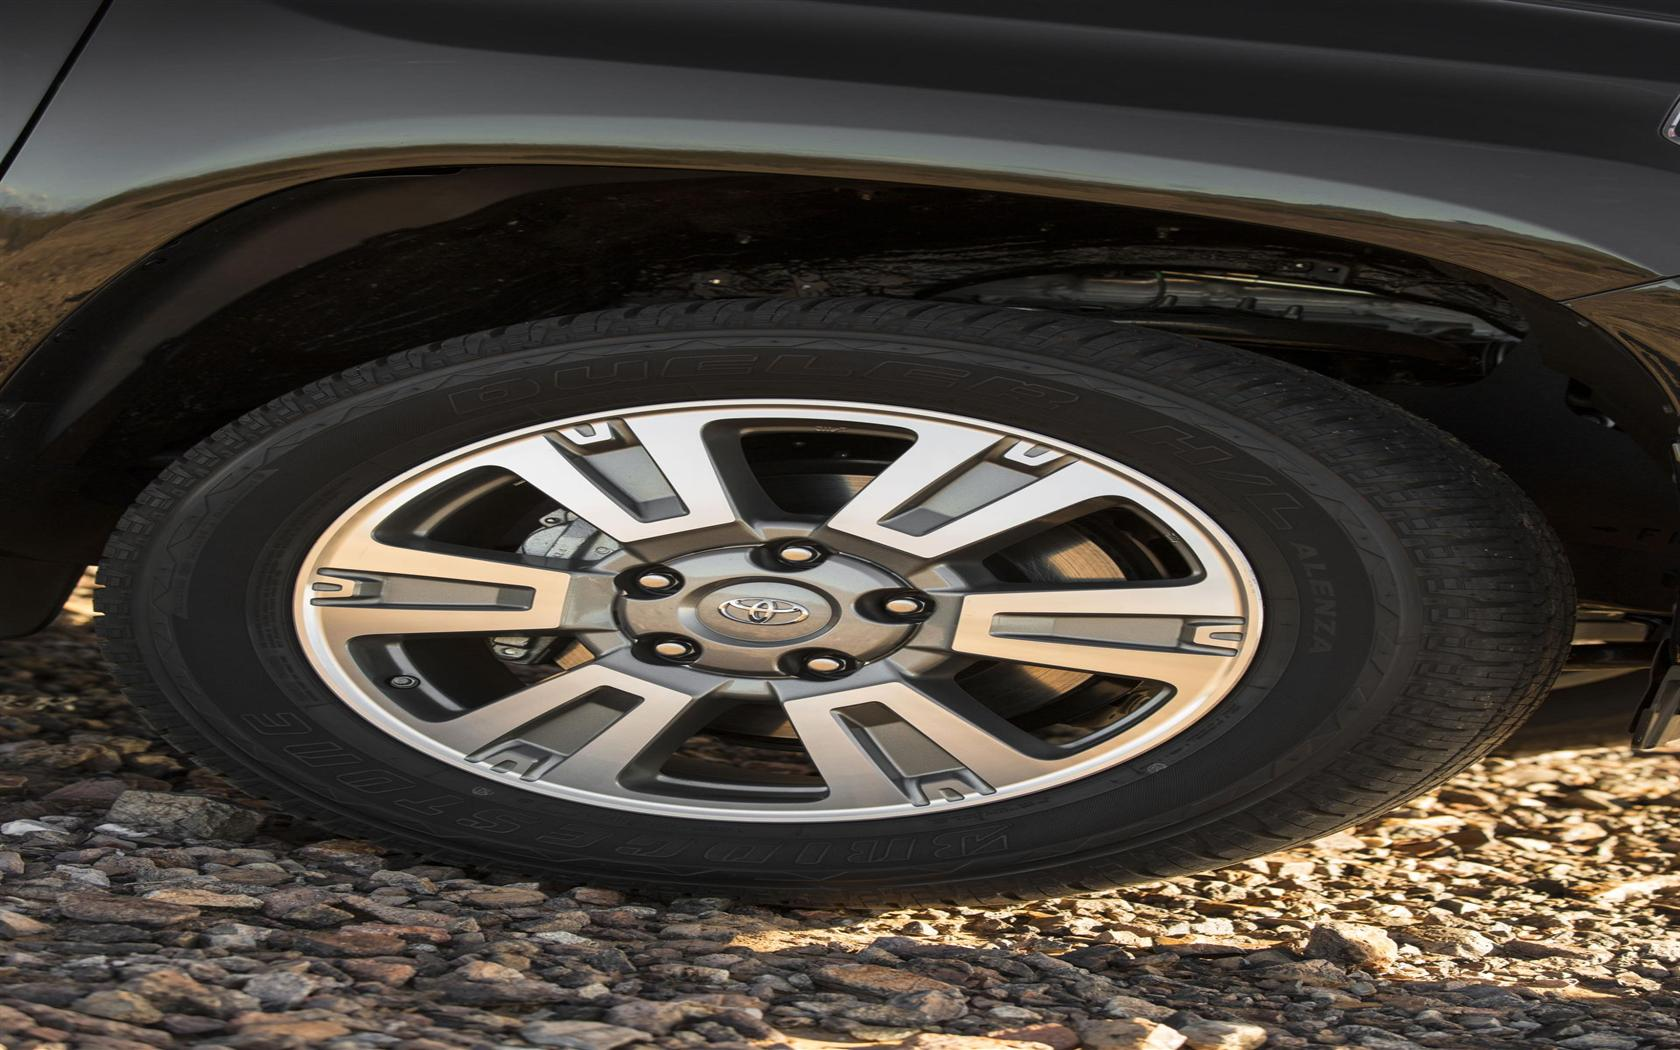 Toyota Tundra 2018 >> 2014 Toyota Tundra Image. Photo 57 of 69